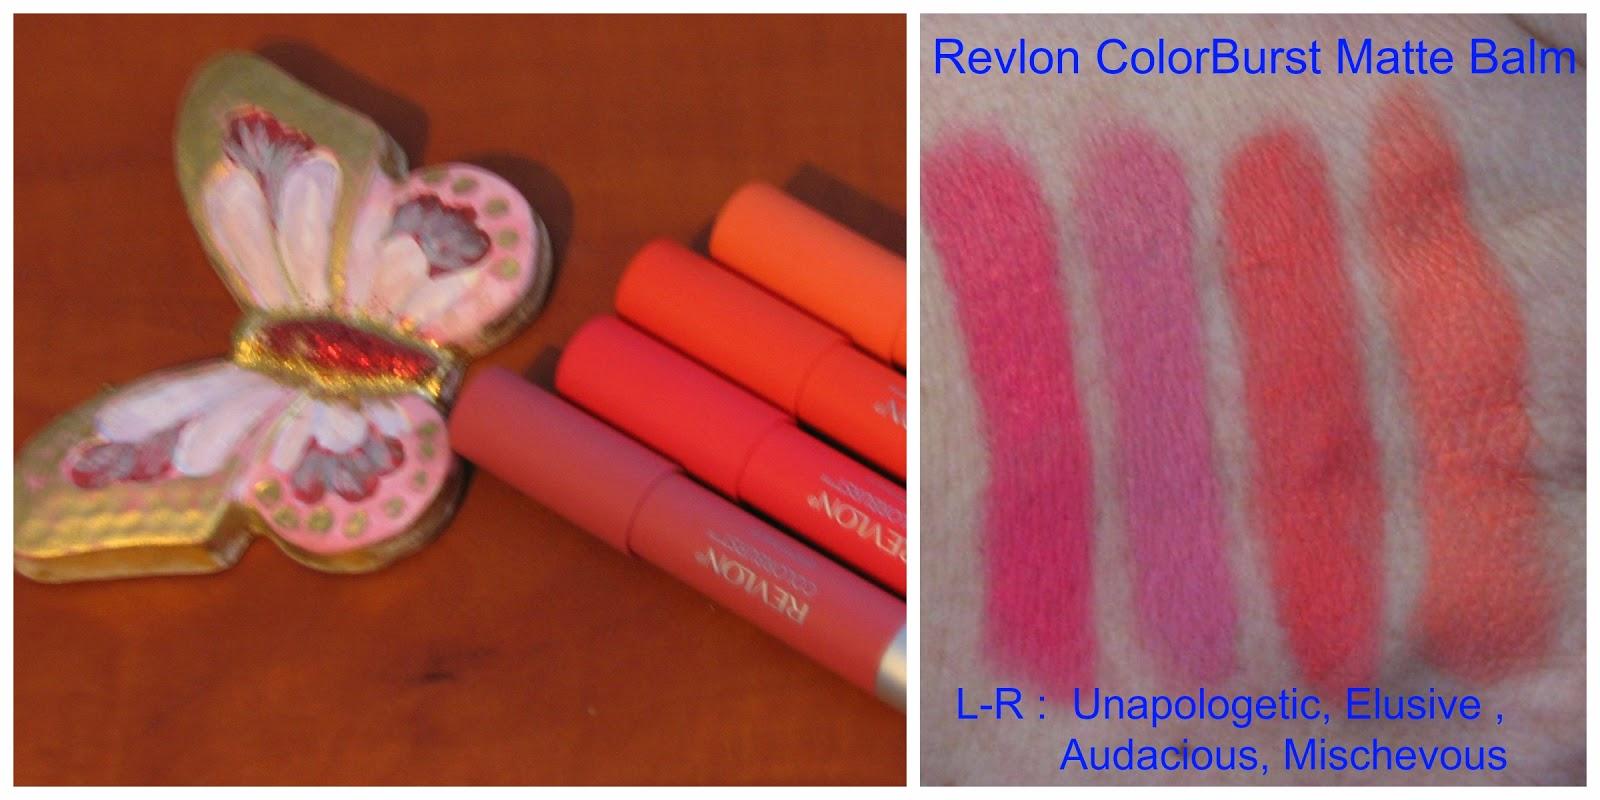 Matte Velvety Lips Revlon Colorburst Balms Swatches Collorbust Balm